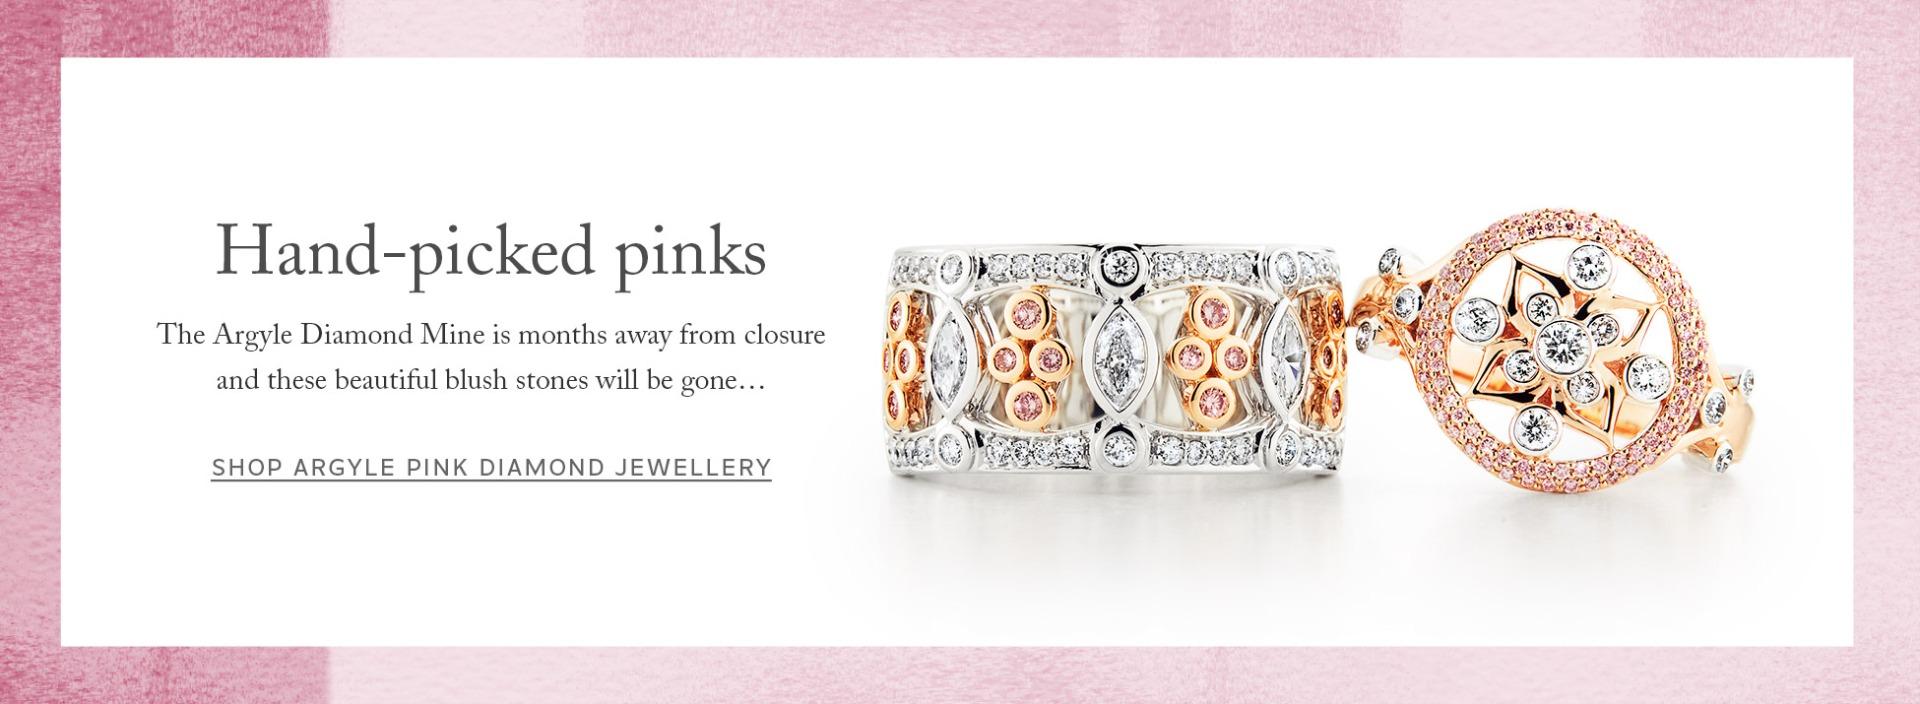 Argyle pink diamond jewellery - shop online now from Australia's coloured diamond specialists